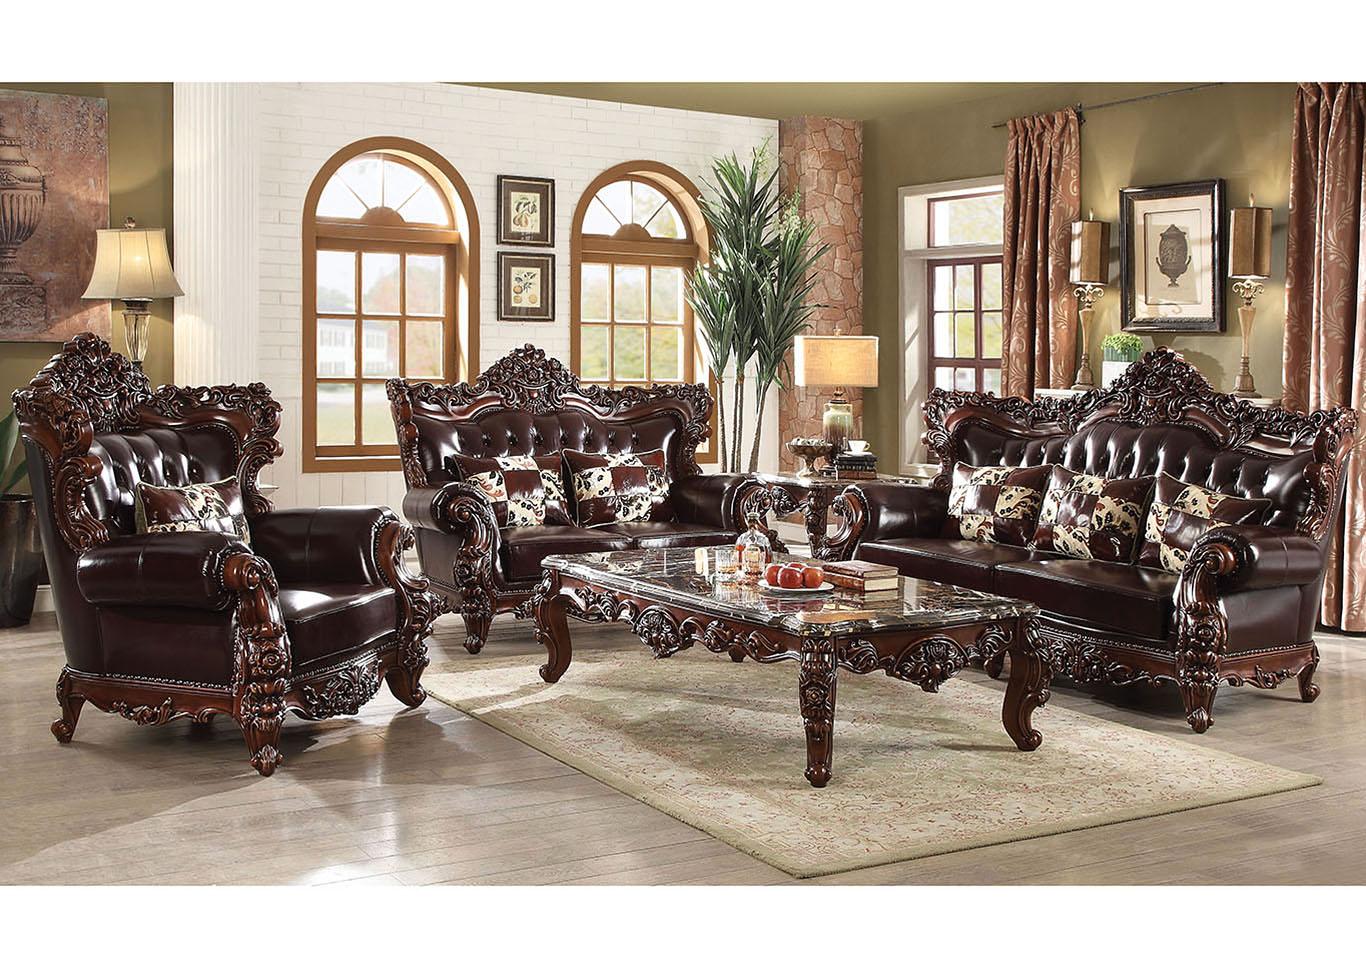 Fabulous Sans Midman Furniture Forsythia Espresso Top Grain Leather Andrewgaddart Wooden Chair Designs For Living Room Andrewgaddartcom